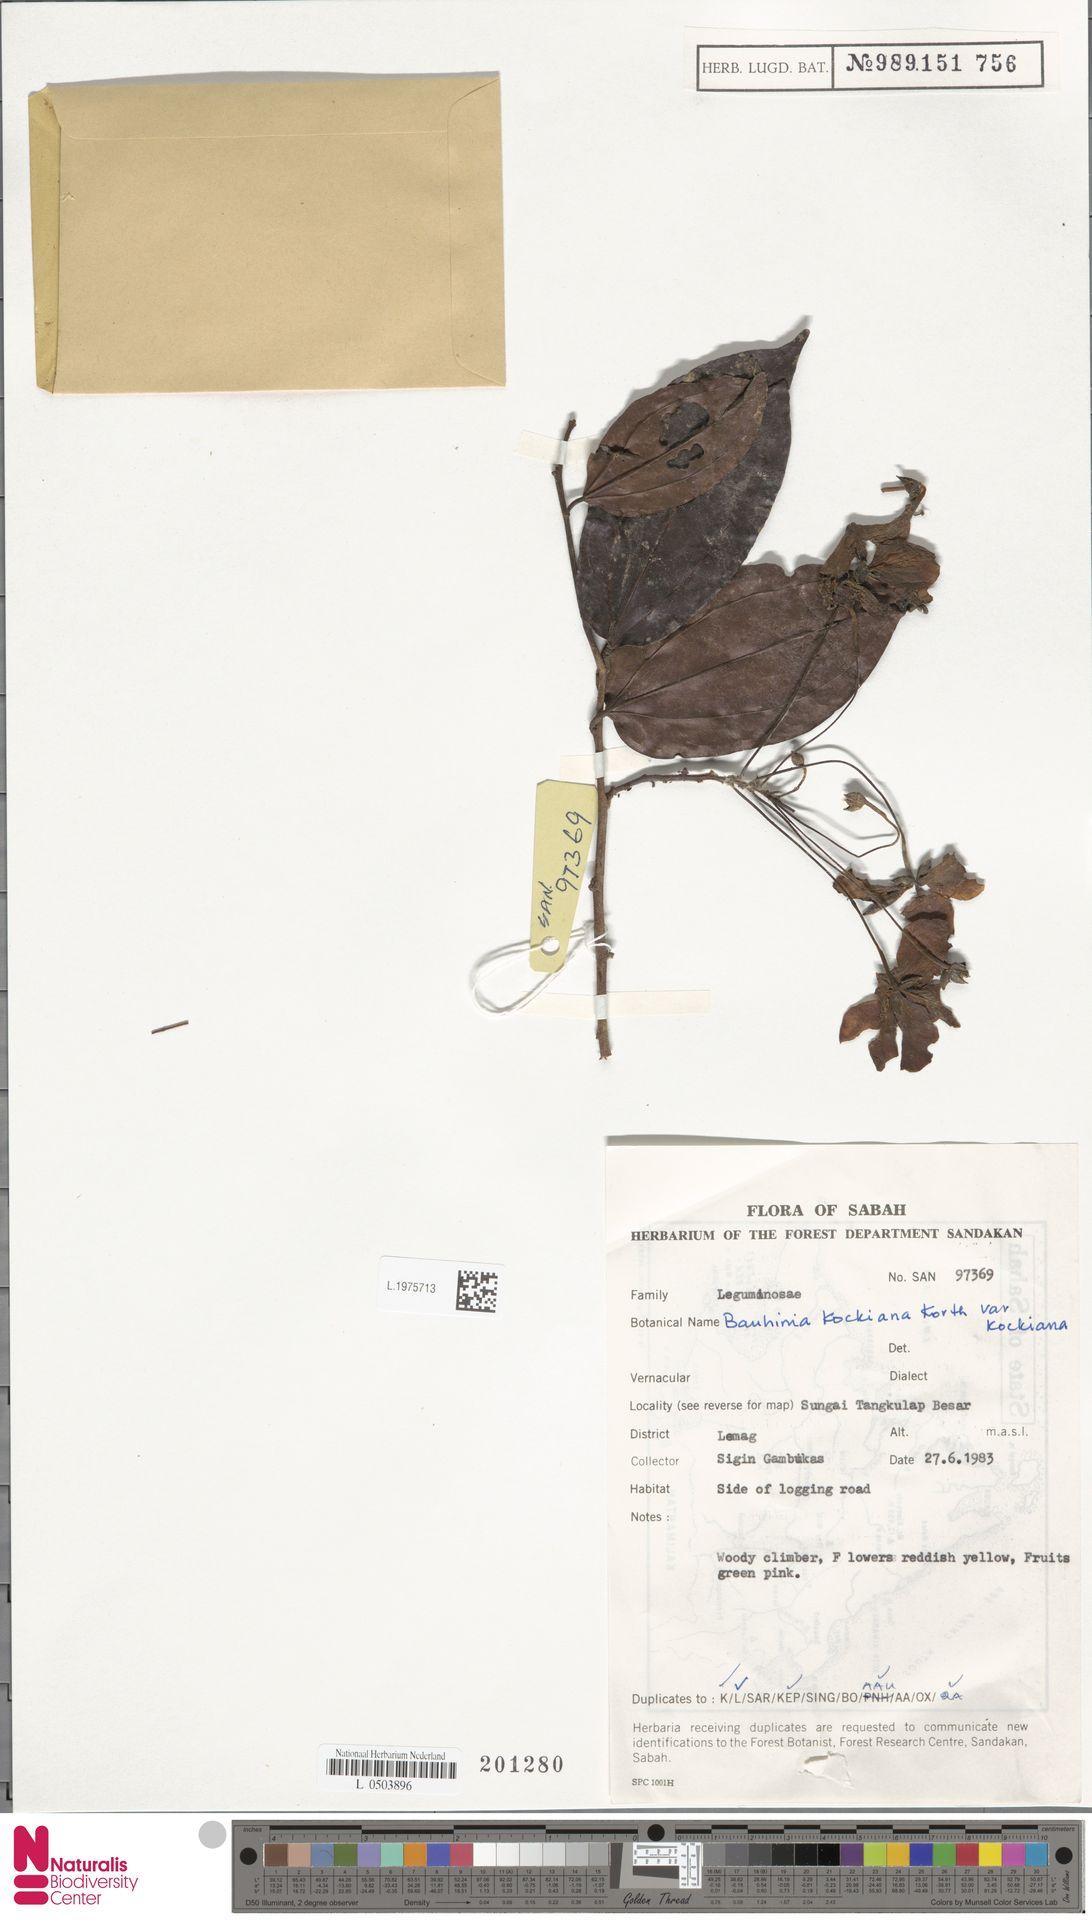 L.1975713   Bauhinia kockiana var. kockiana